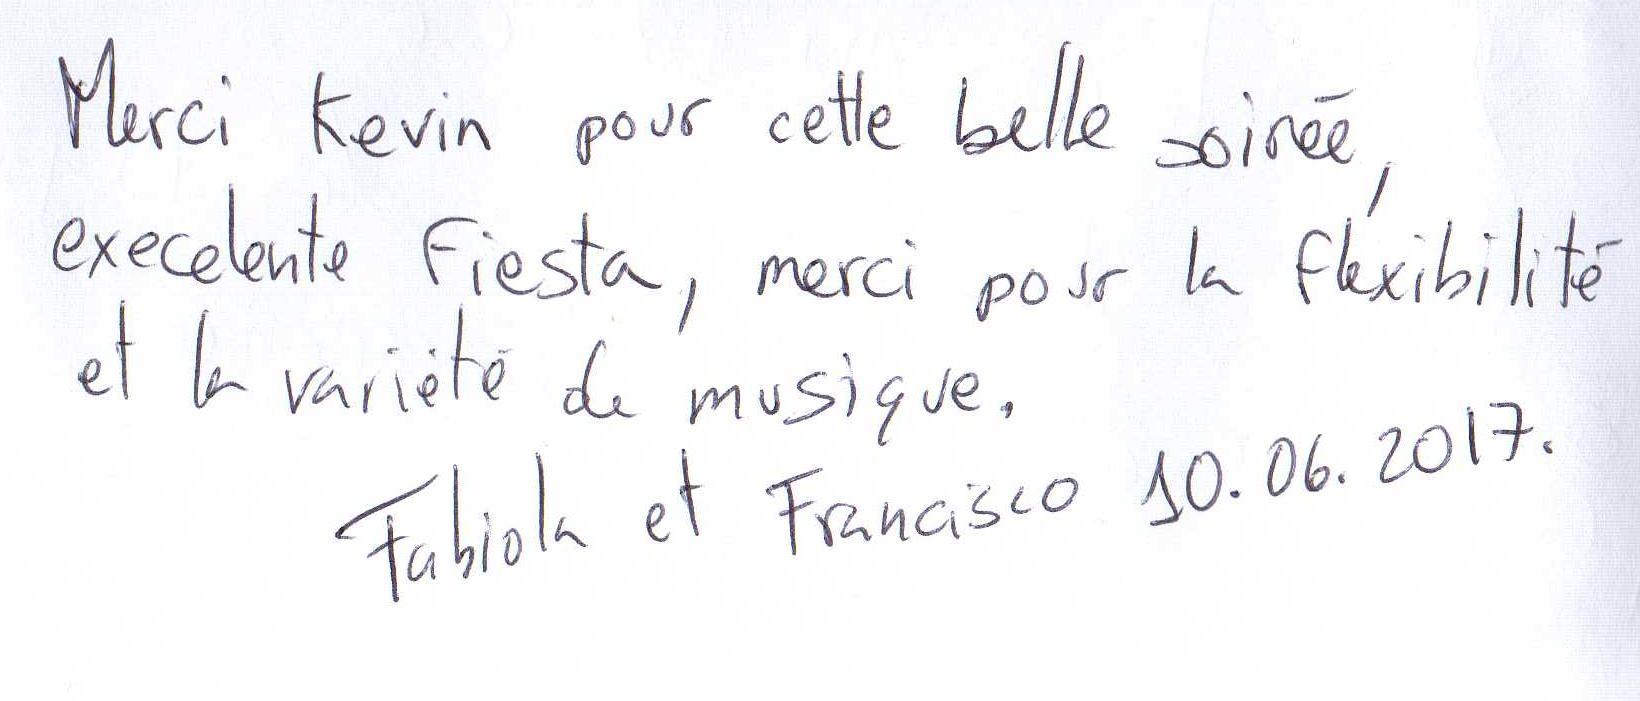 Mariage_de_FABIOLA_&_FRANCISCO_LIBRETTI_au_Château_de_RIPAILLE_Samedi_10.._[1]